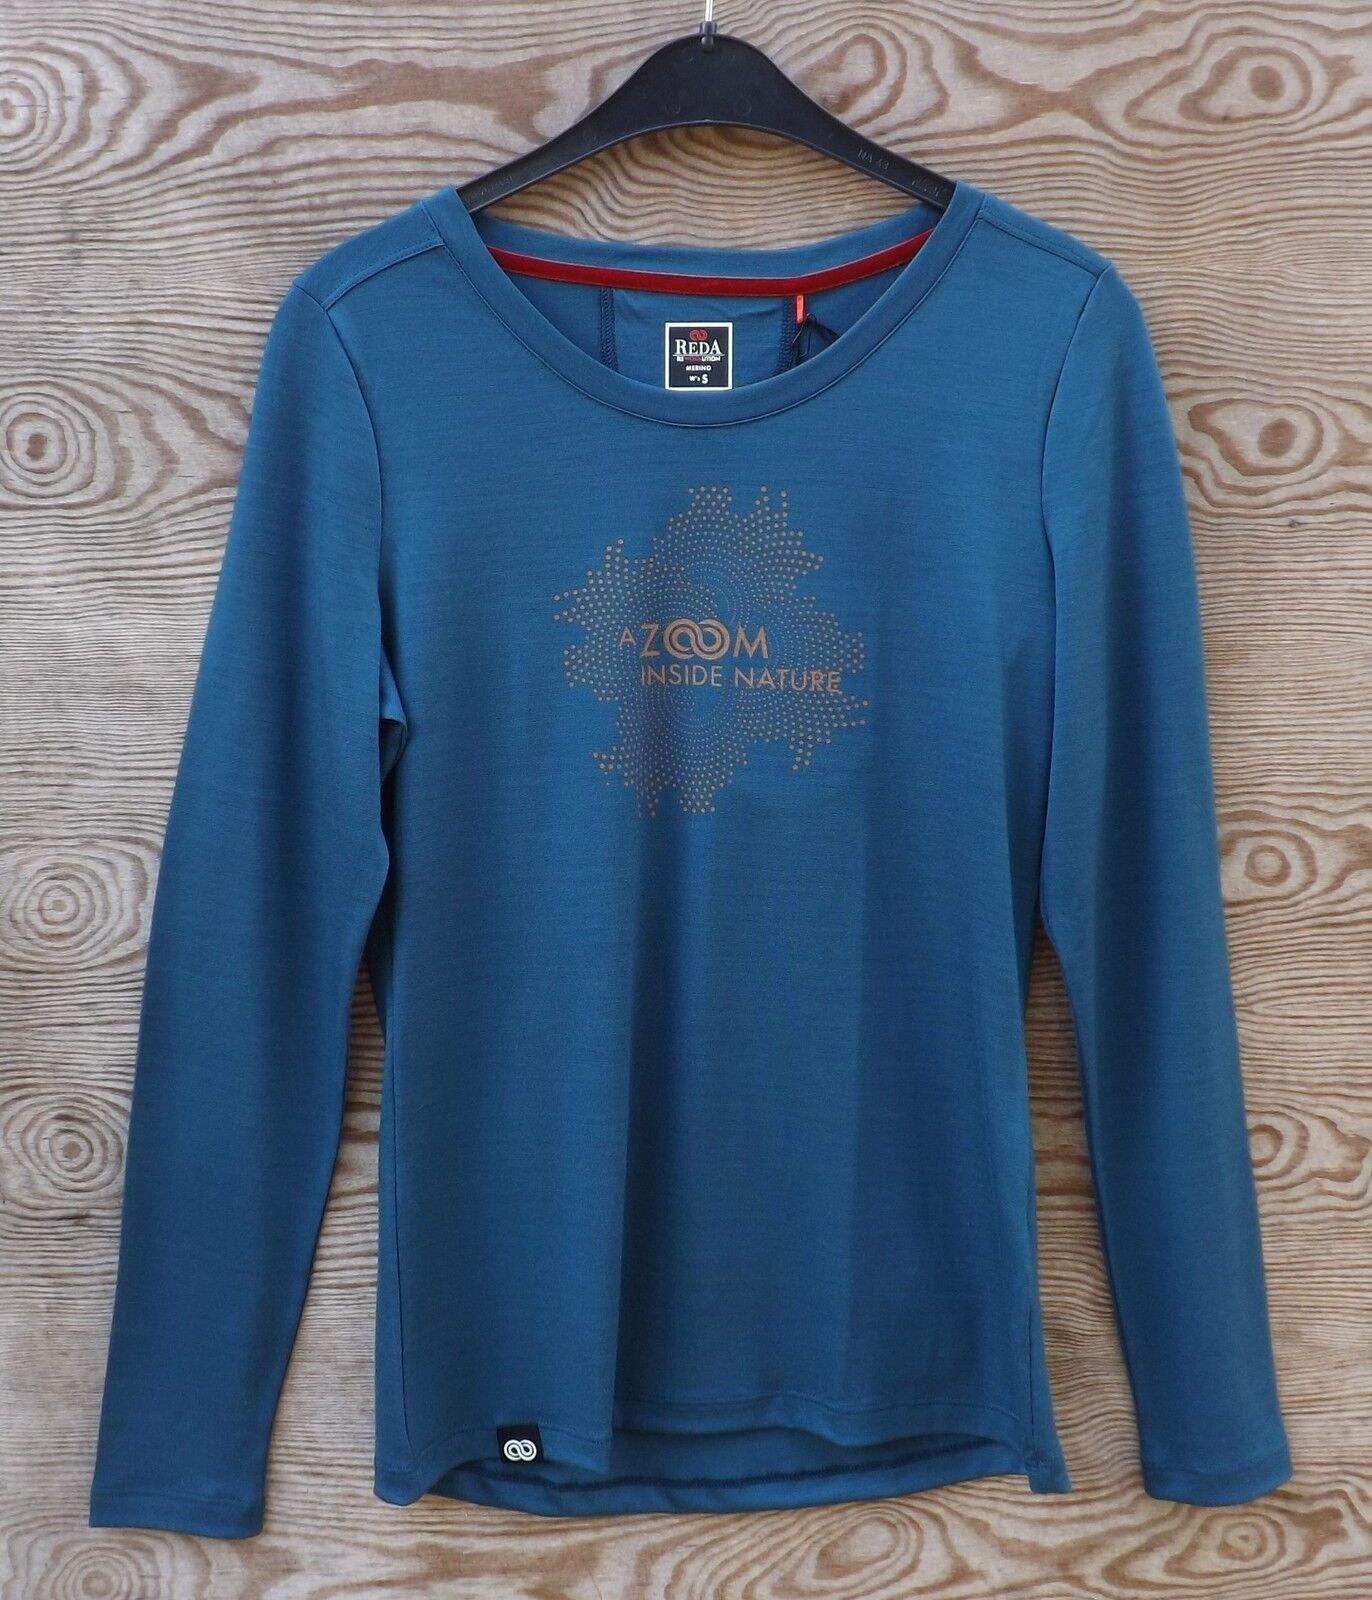 rotA Rewoolution Zoom  daSie Merino T Long Short Sleeve 190  Merinowolle